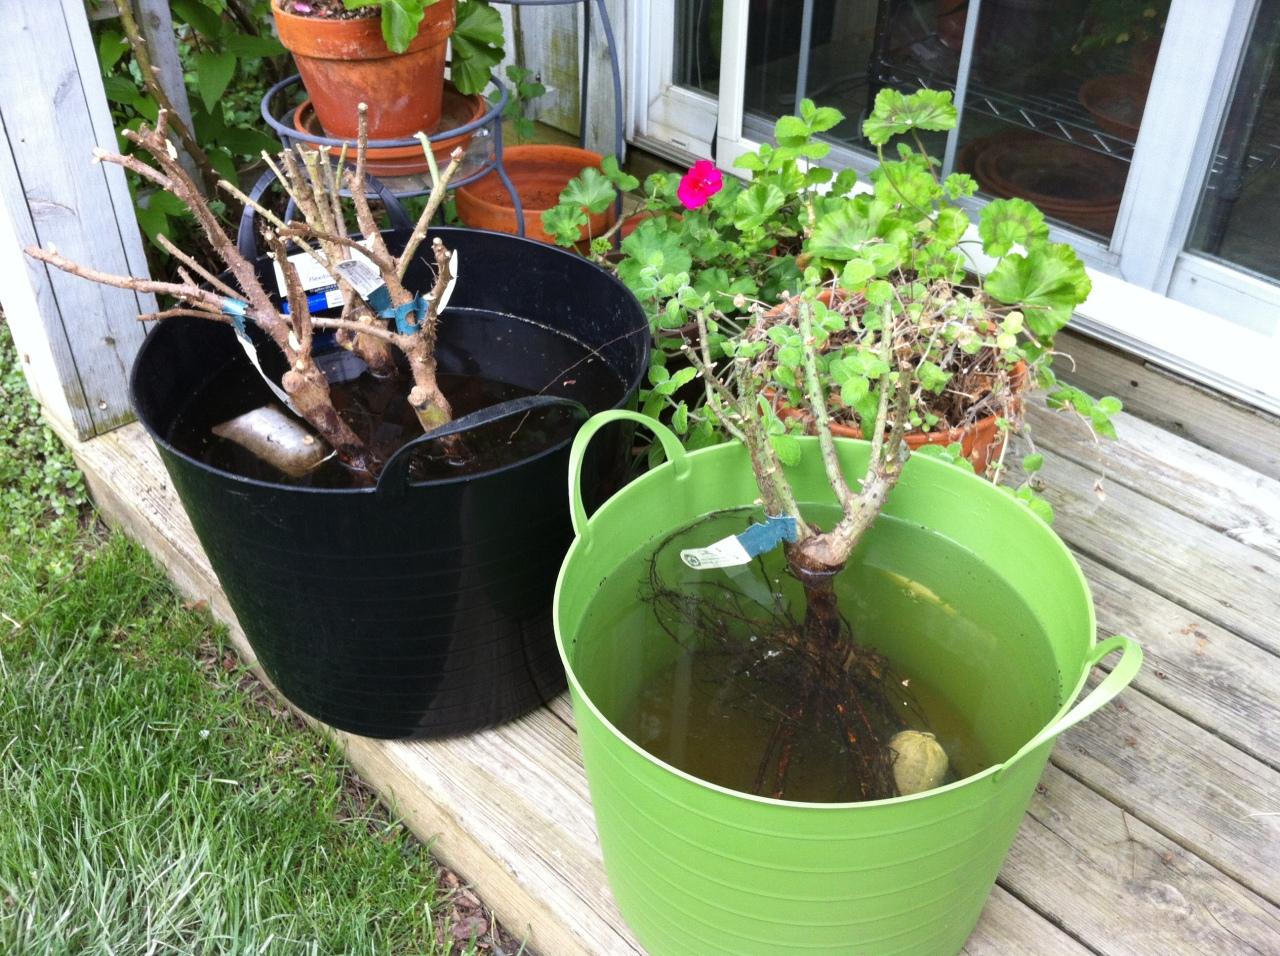 Bare roots soaking in Moo Poo Tea...